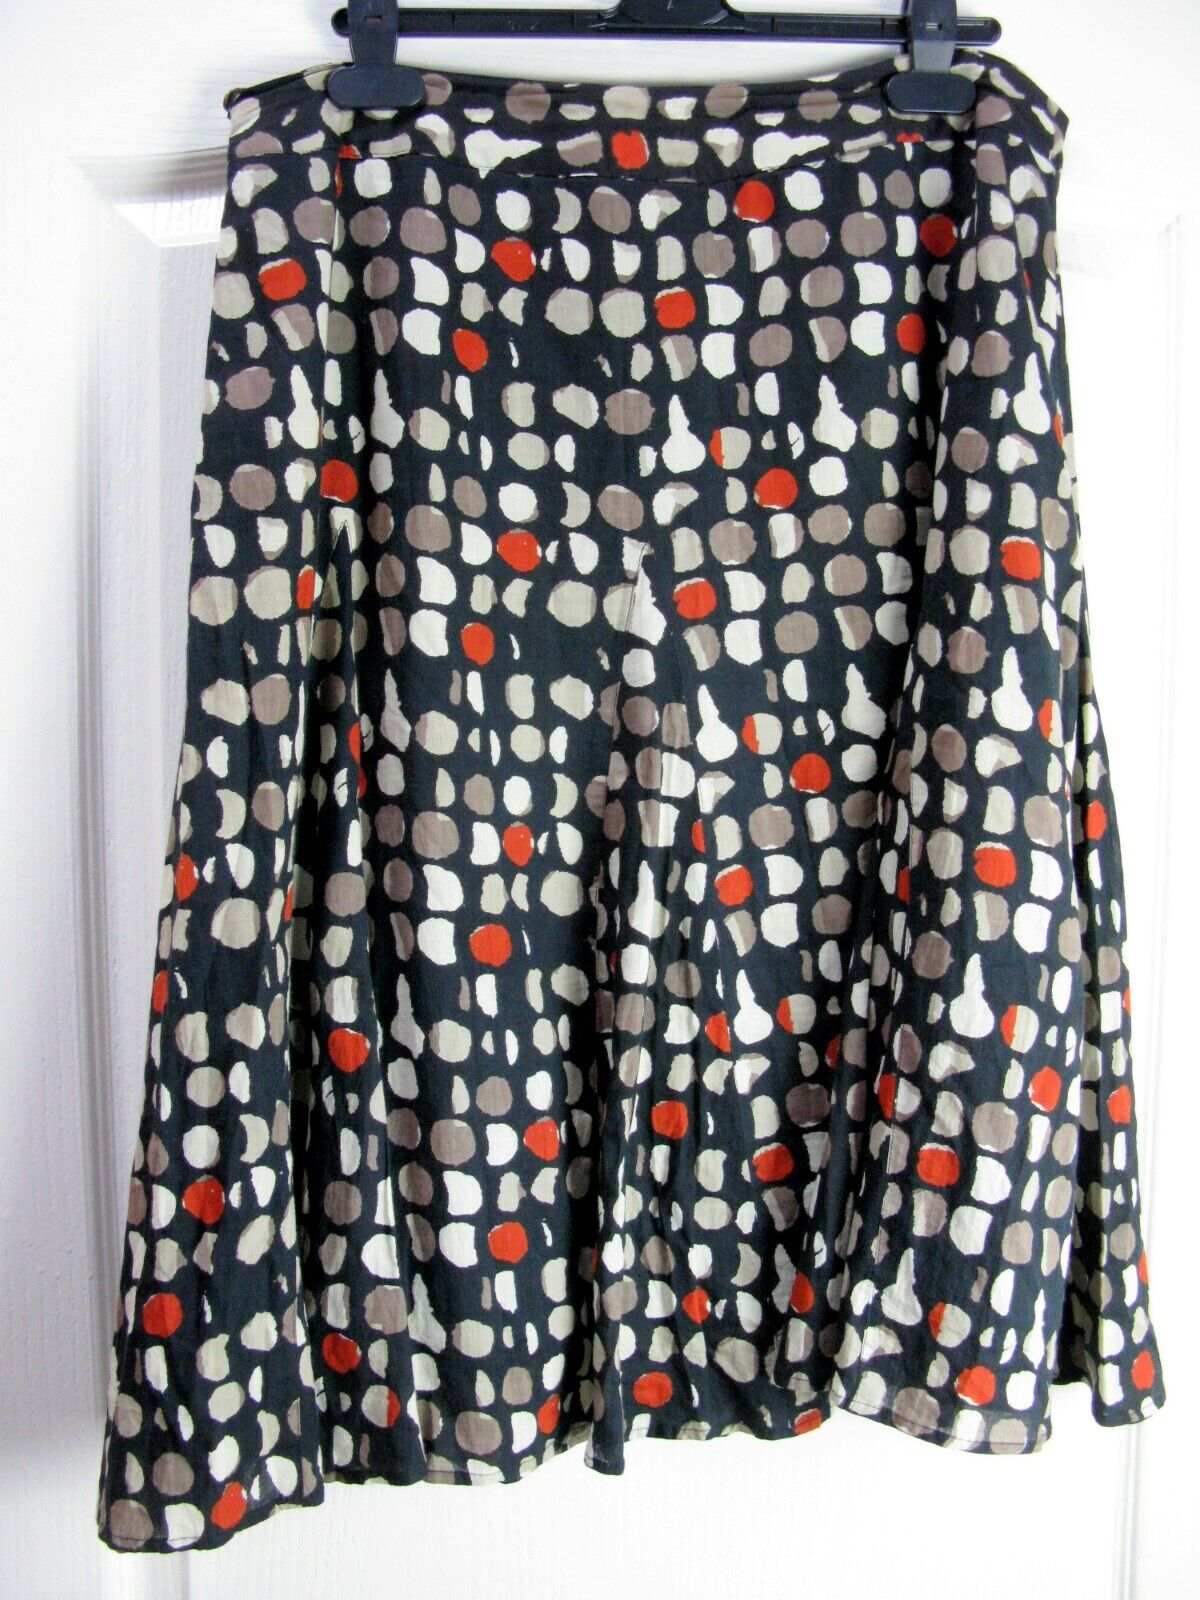 Anokhi For EAST Cotton Full Skirt Sz 14 Boho Ethnic Artisan Quirky Arty Bohemian